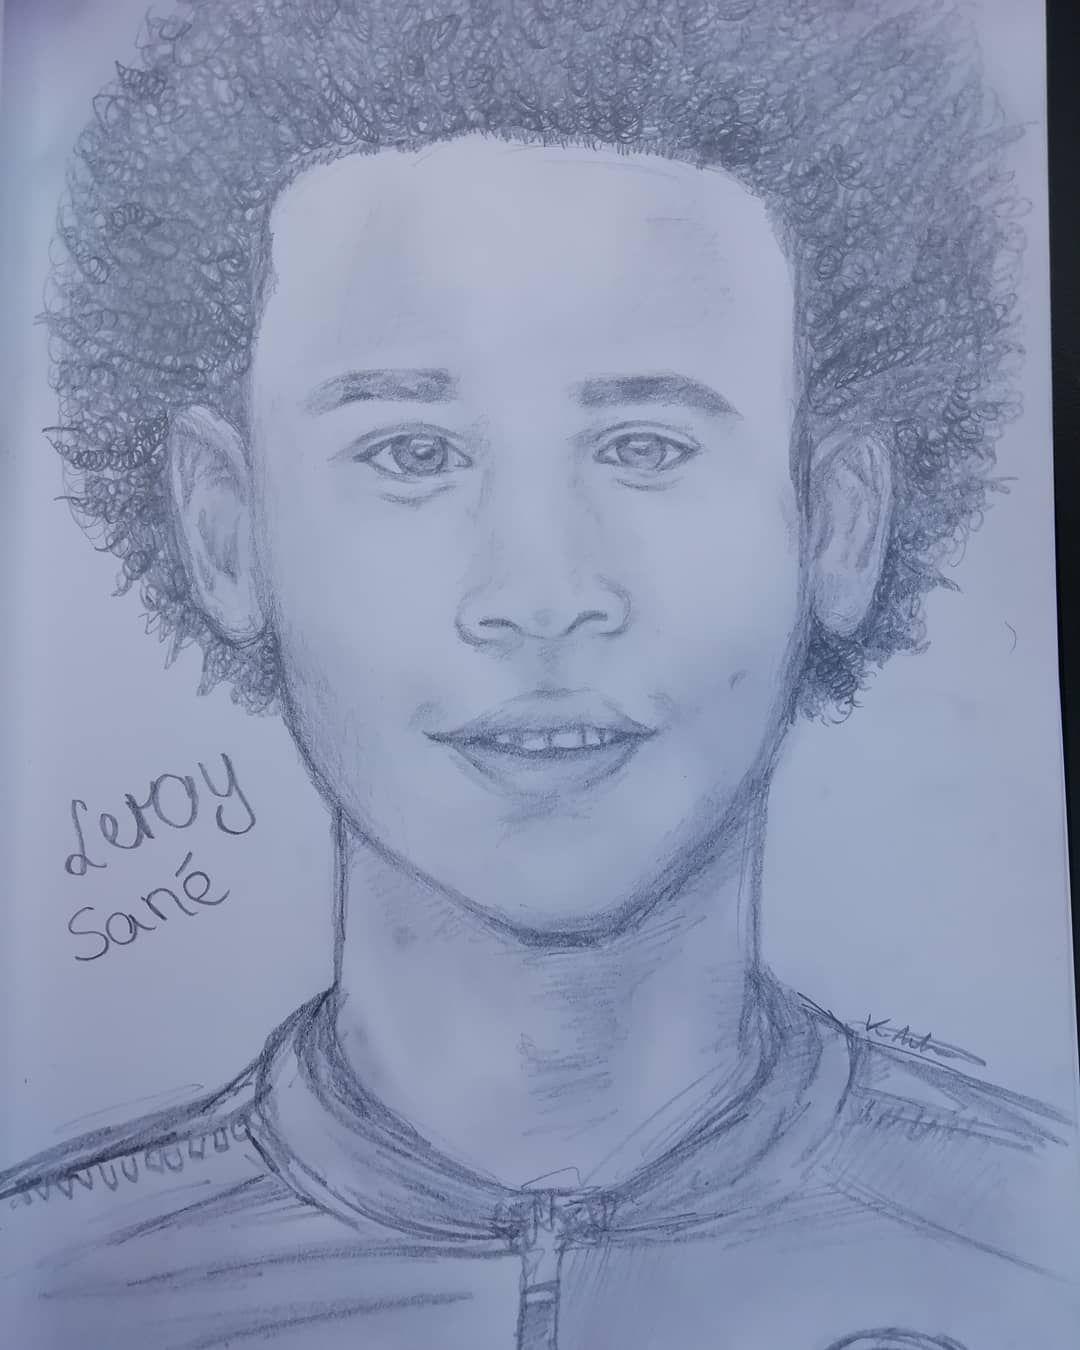 Ls19 Leroy Sane Fcb Mancity Drawing Fussball Zeichnen Malen Real Fussballer Mydraw Insane Drawings Male Sketch Art